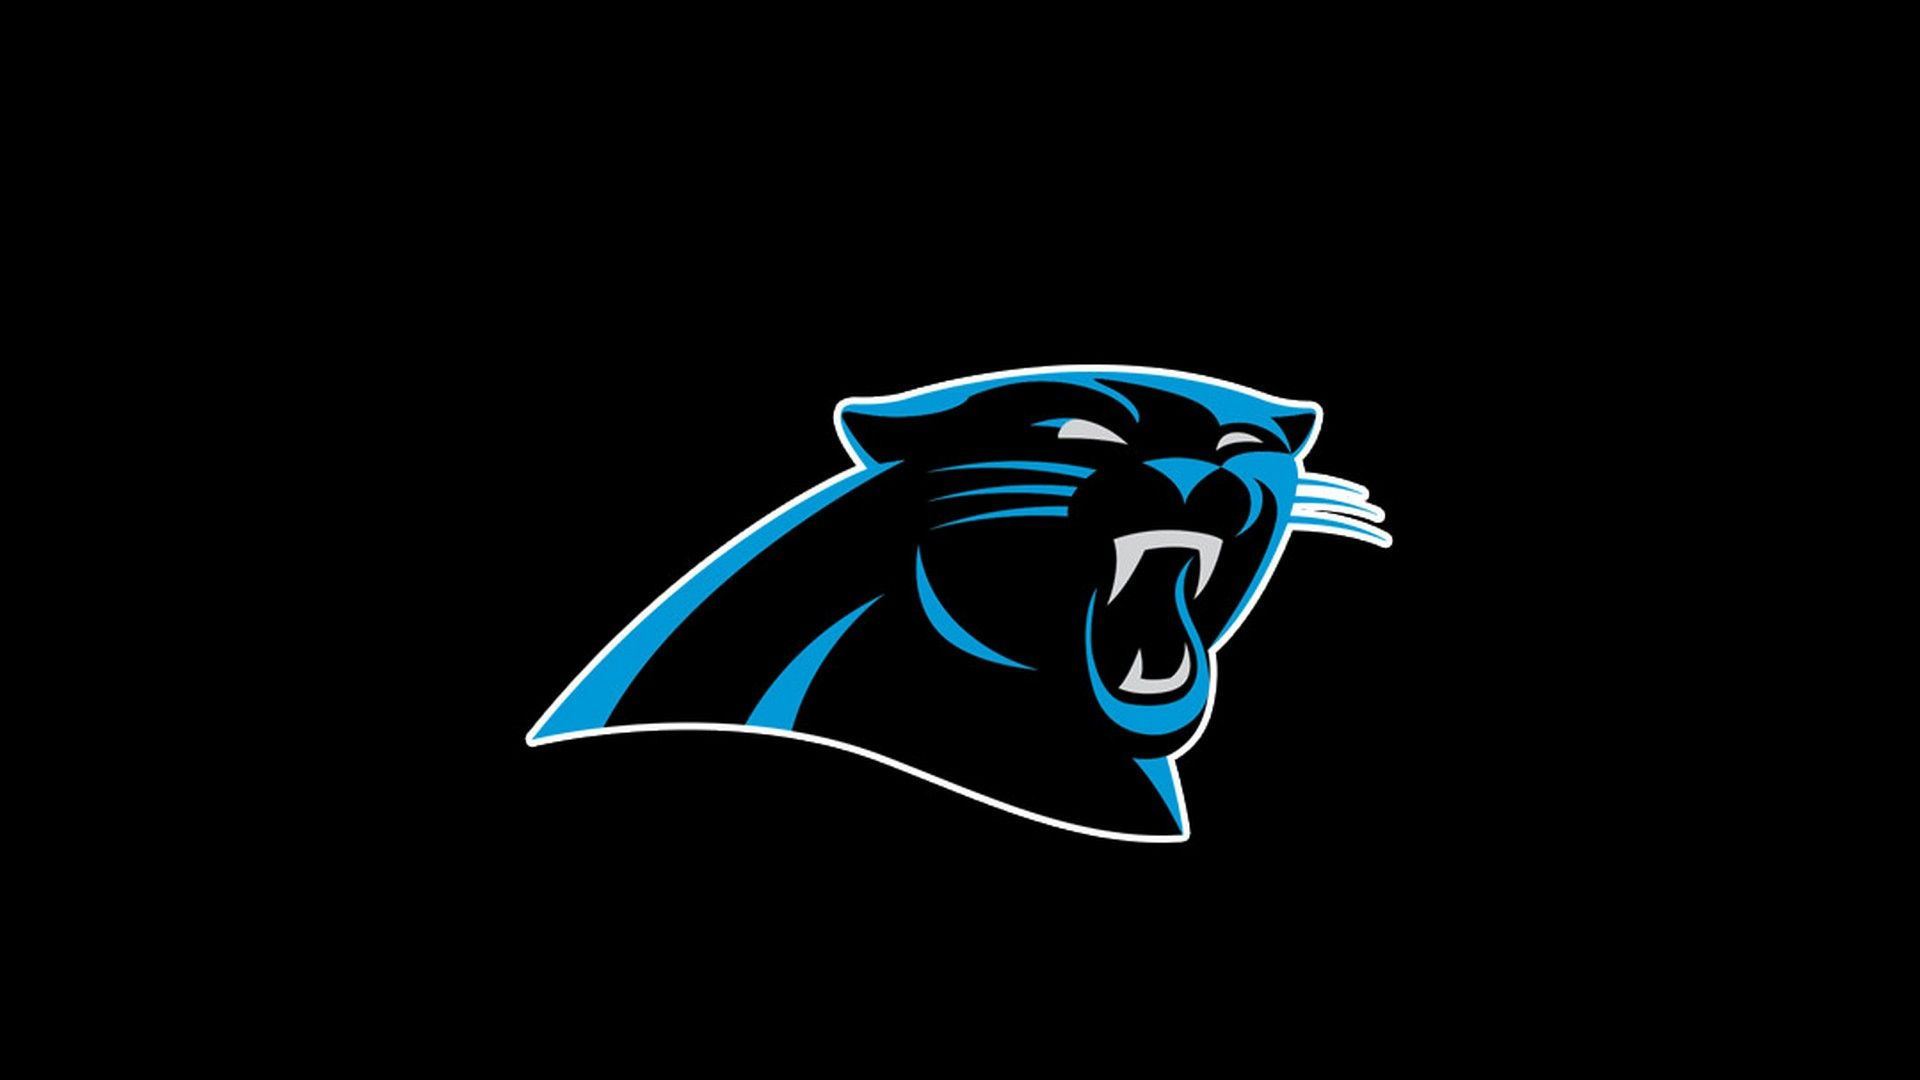 Hd Desktop Wallpaper Carolina Panthers 2021 Nfl Football Wallpapers Atlanta Falcons Wallpaper Nfl Football Wallpaper Carolina Panthers